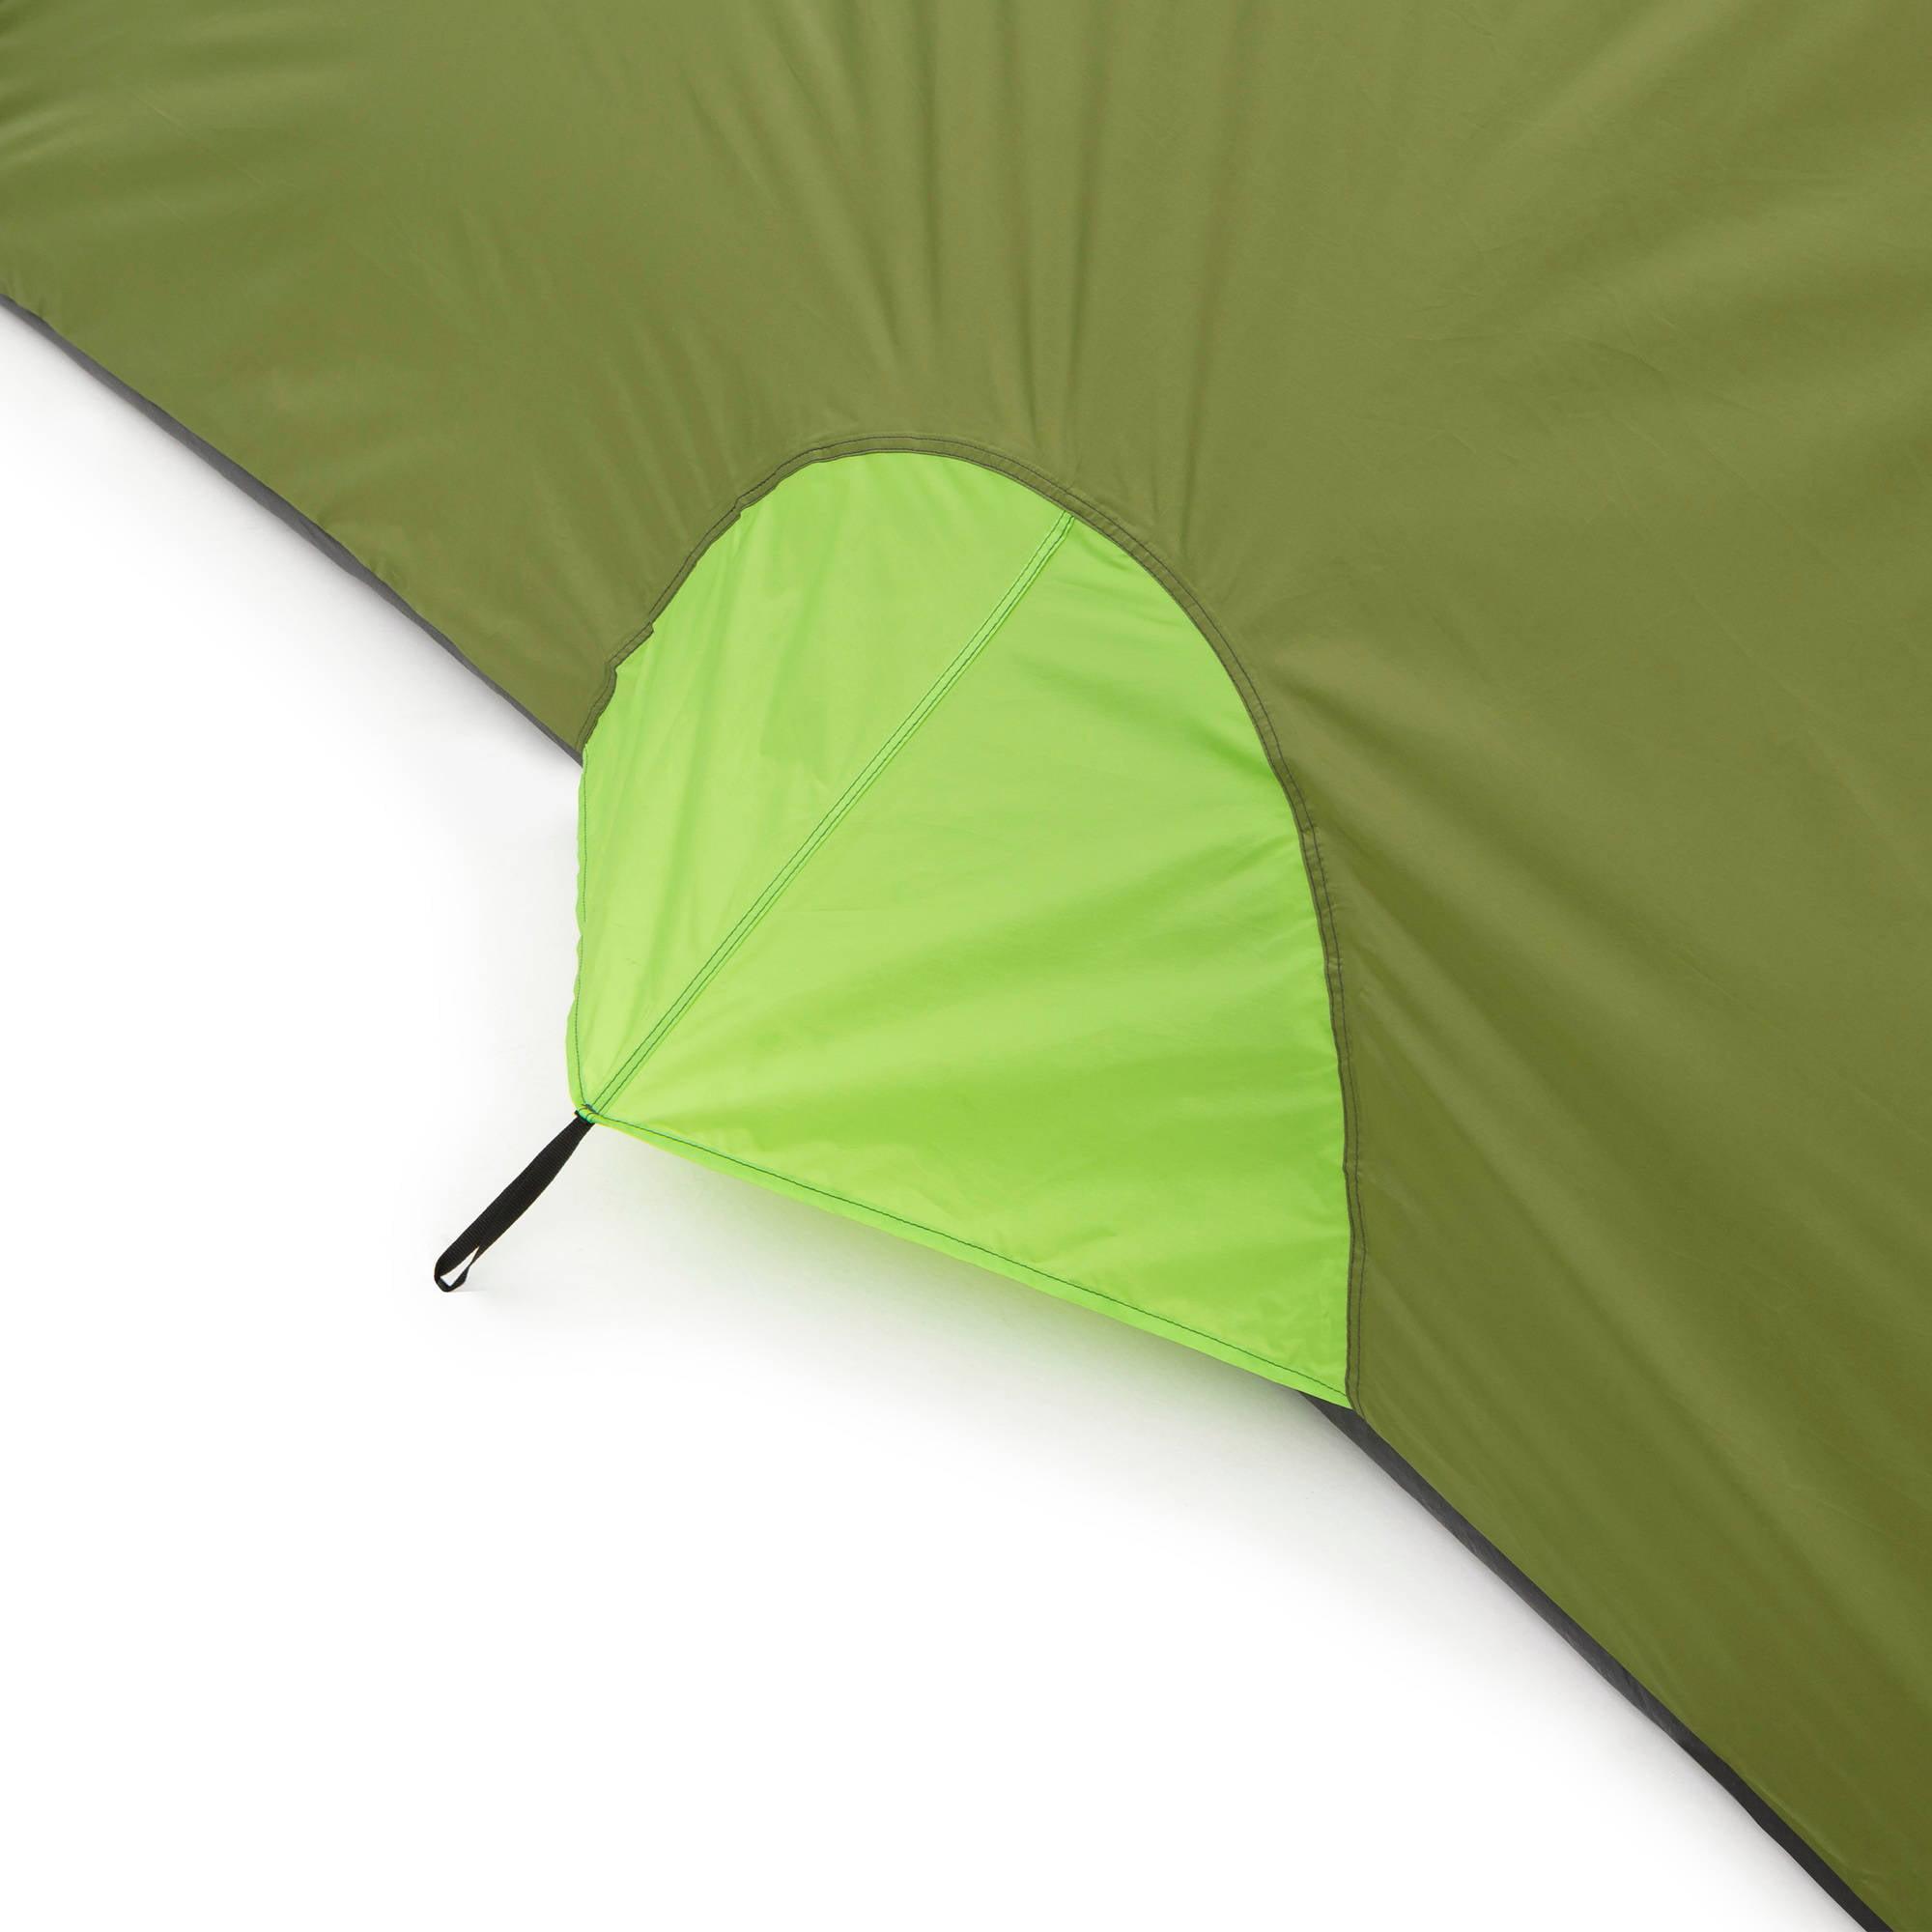 sc 1 st  Walmart & Ozark Trail 6 Person Instant Cabin Tent - Walmart.com